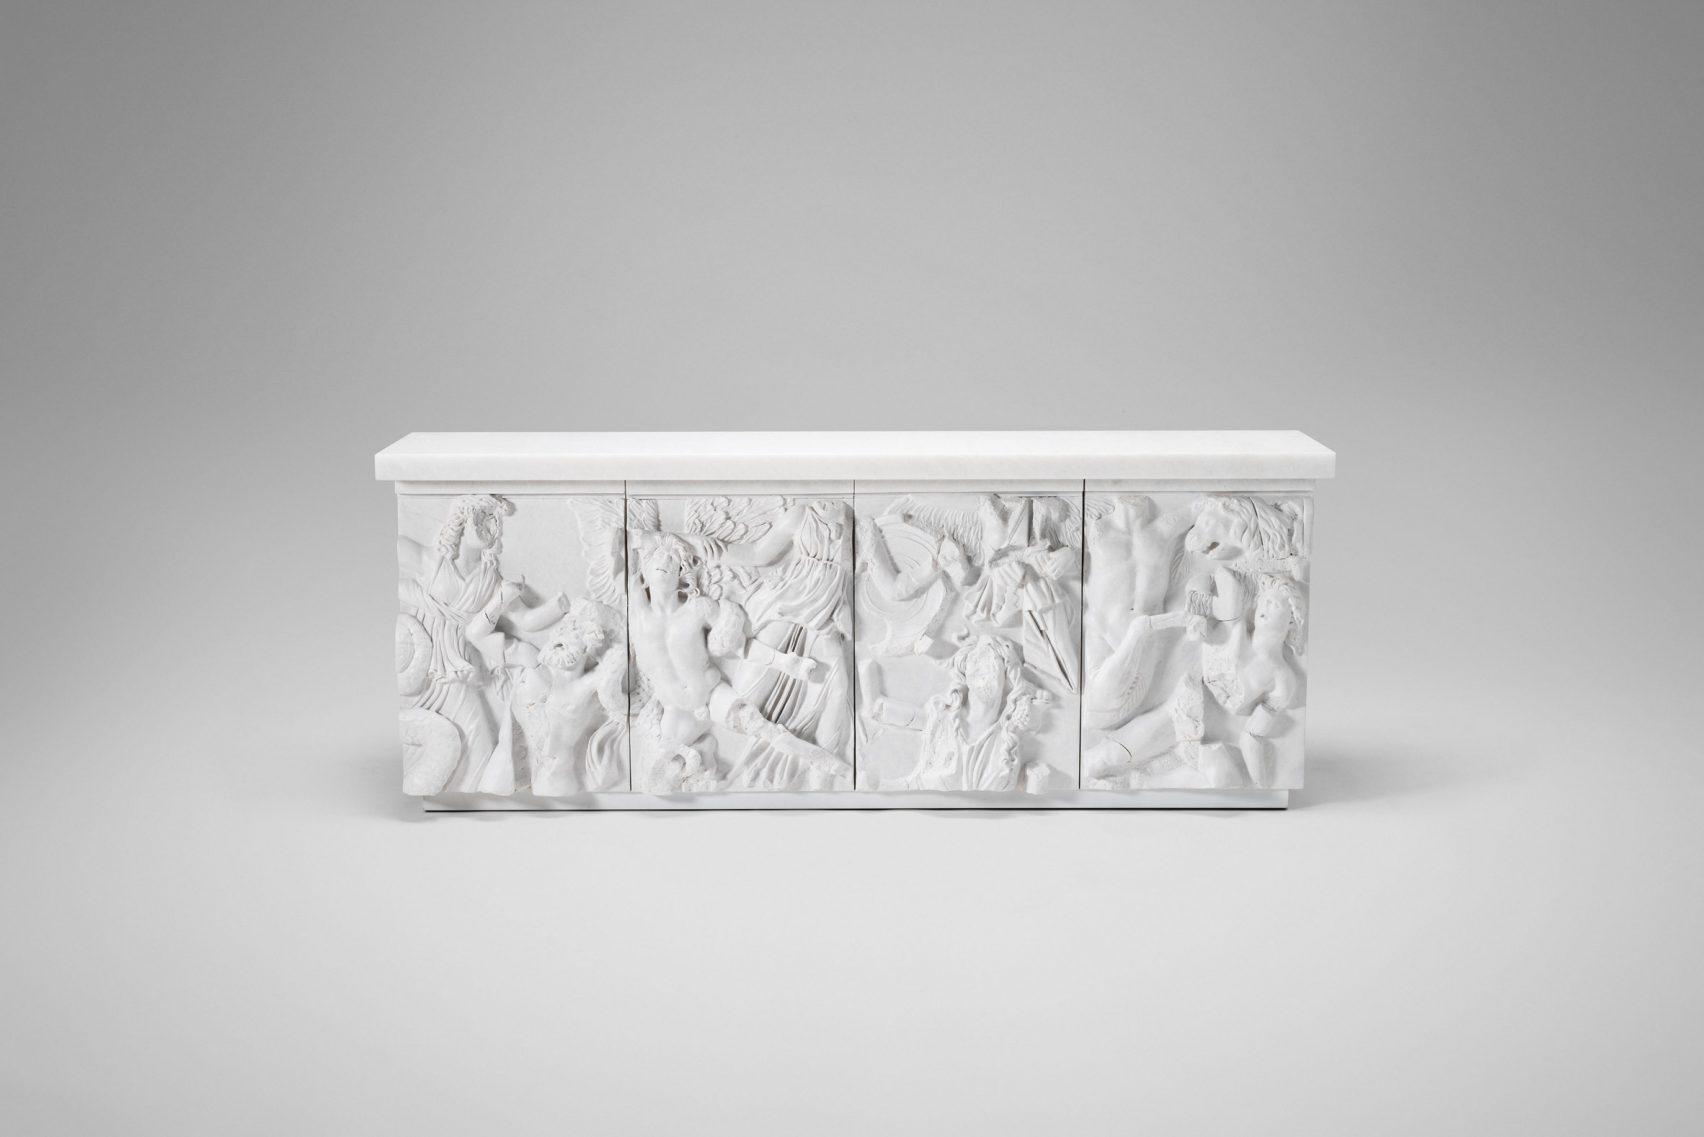 sebastian-errazuriz-exhibition-design-furniture-accessories-_dezeen_2364_col_0-1704x1137